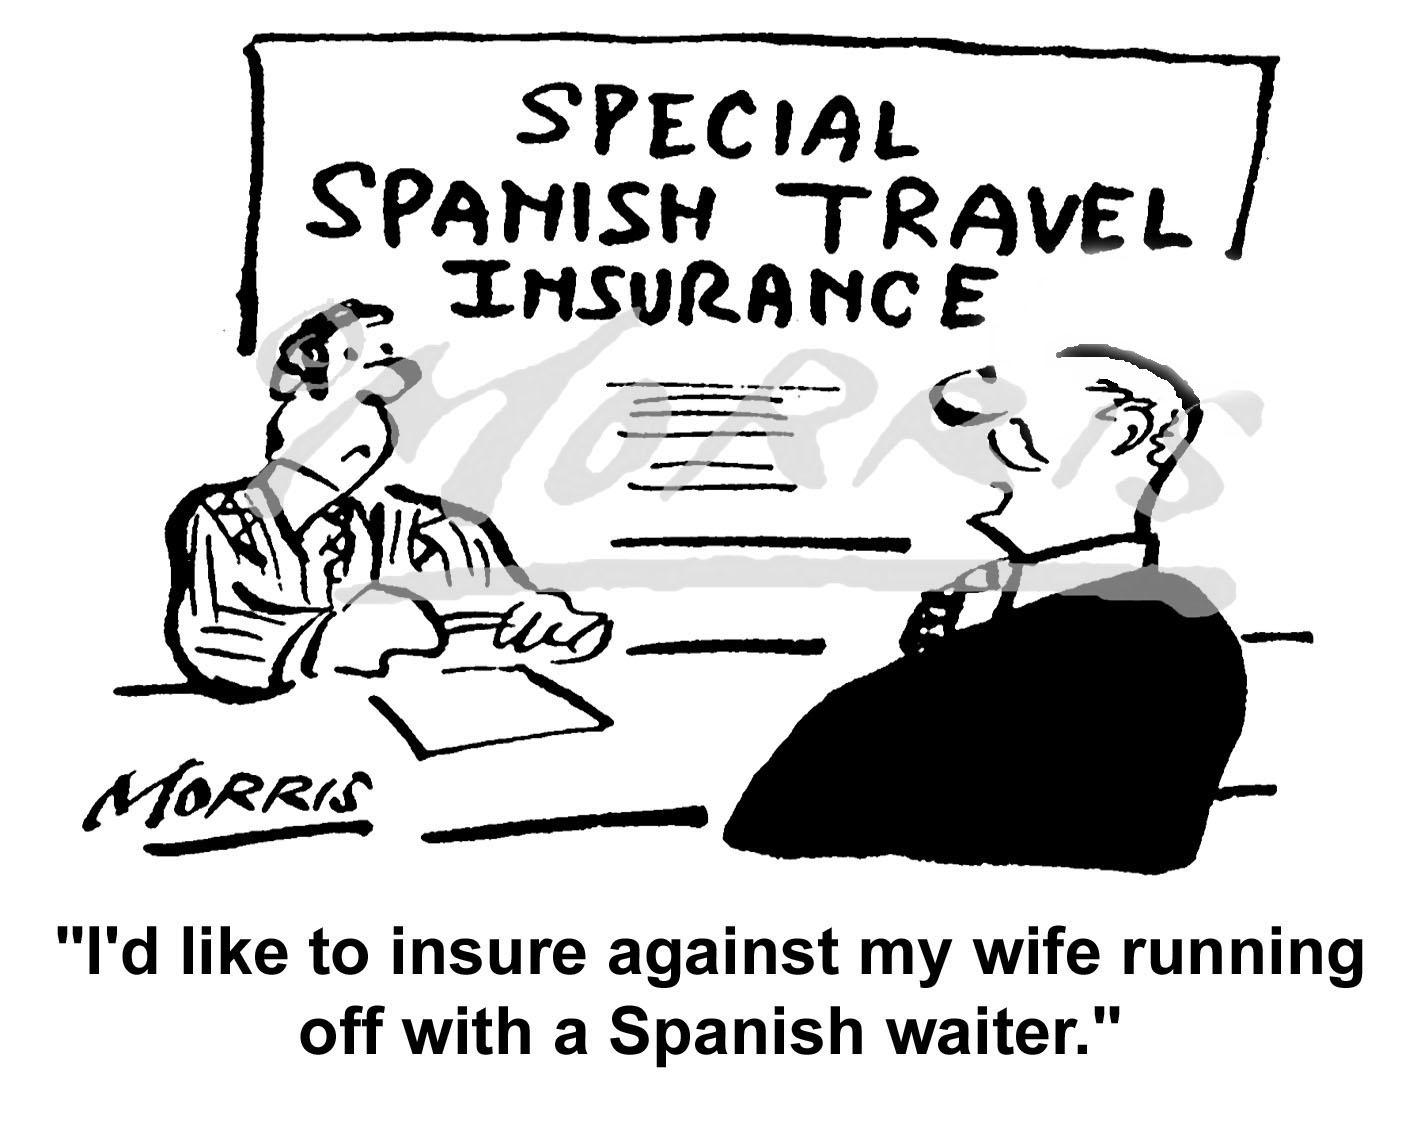 Travel insurance cartoon Ref: 0301bw